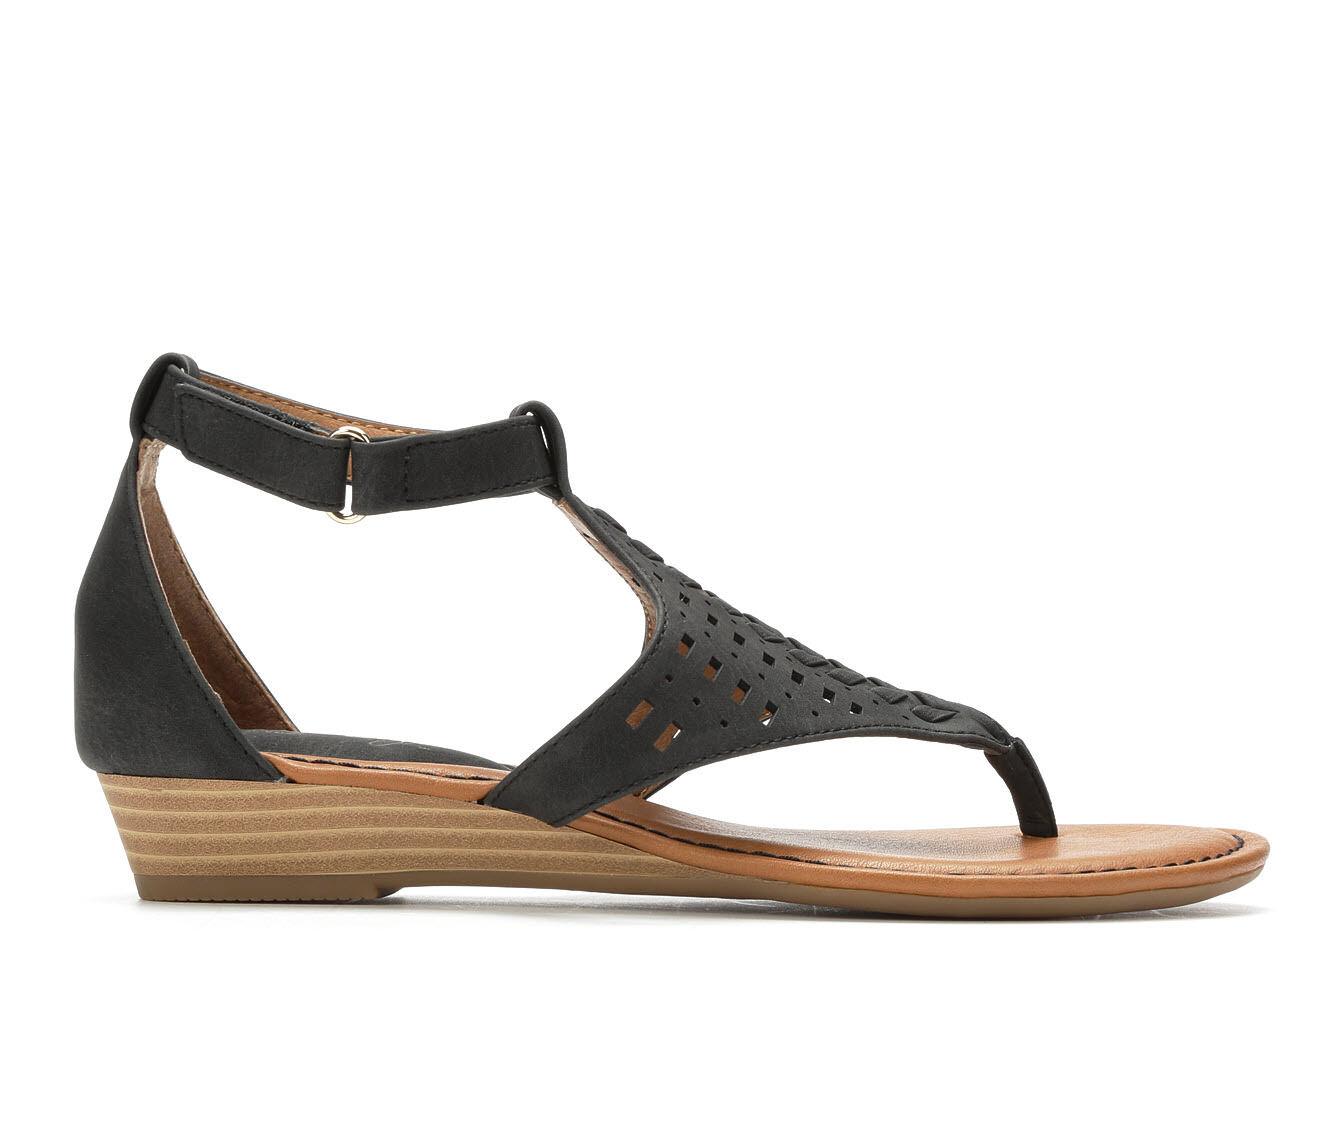 Women's EuroSoft Addley Dress Sandals best place to buy sale 100% original 68MBkSLT